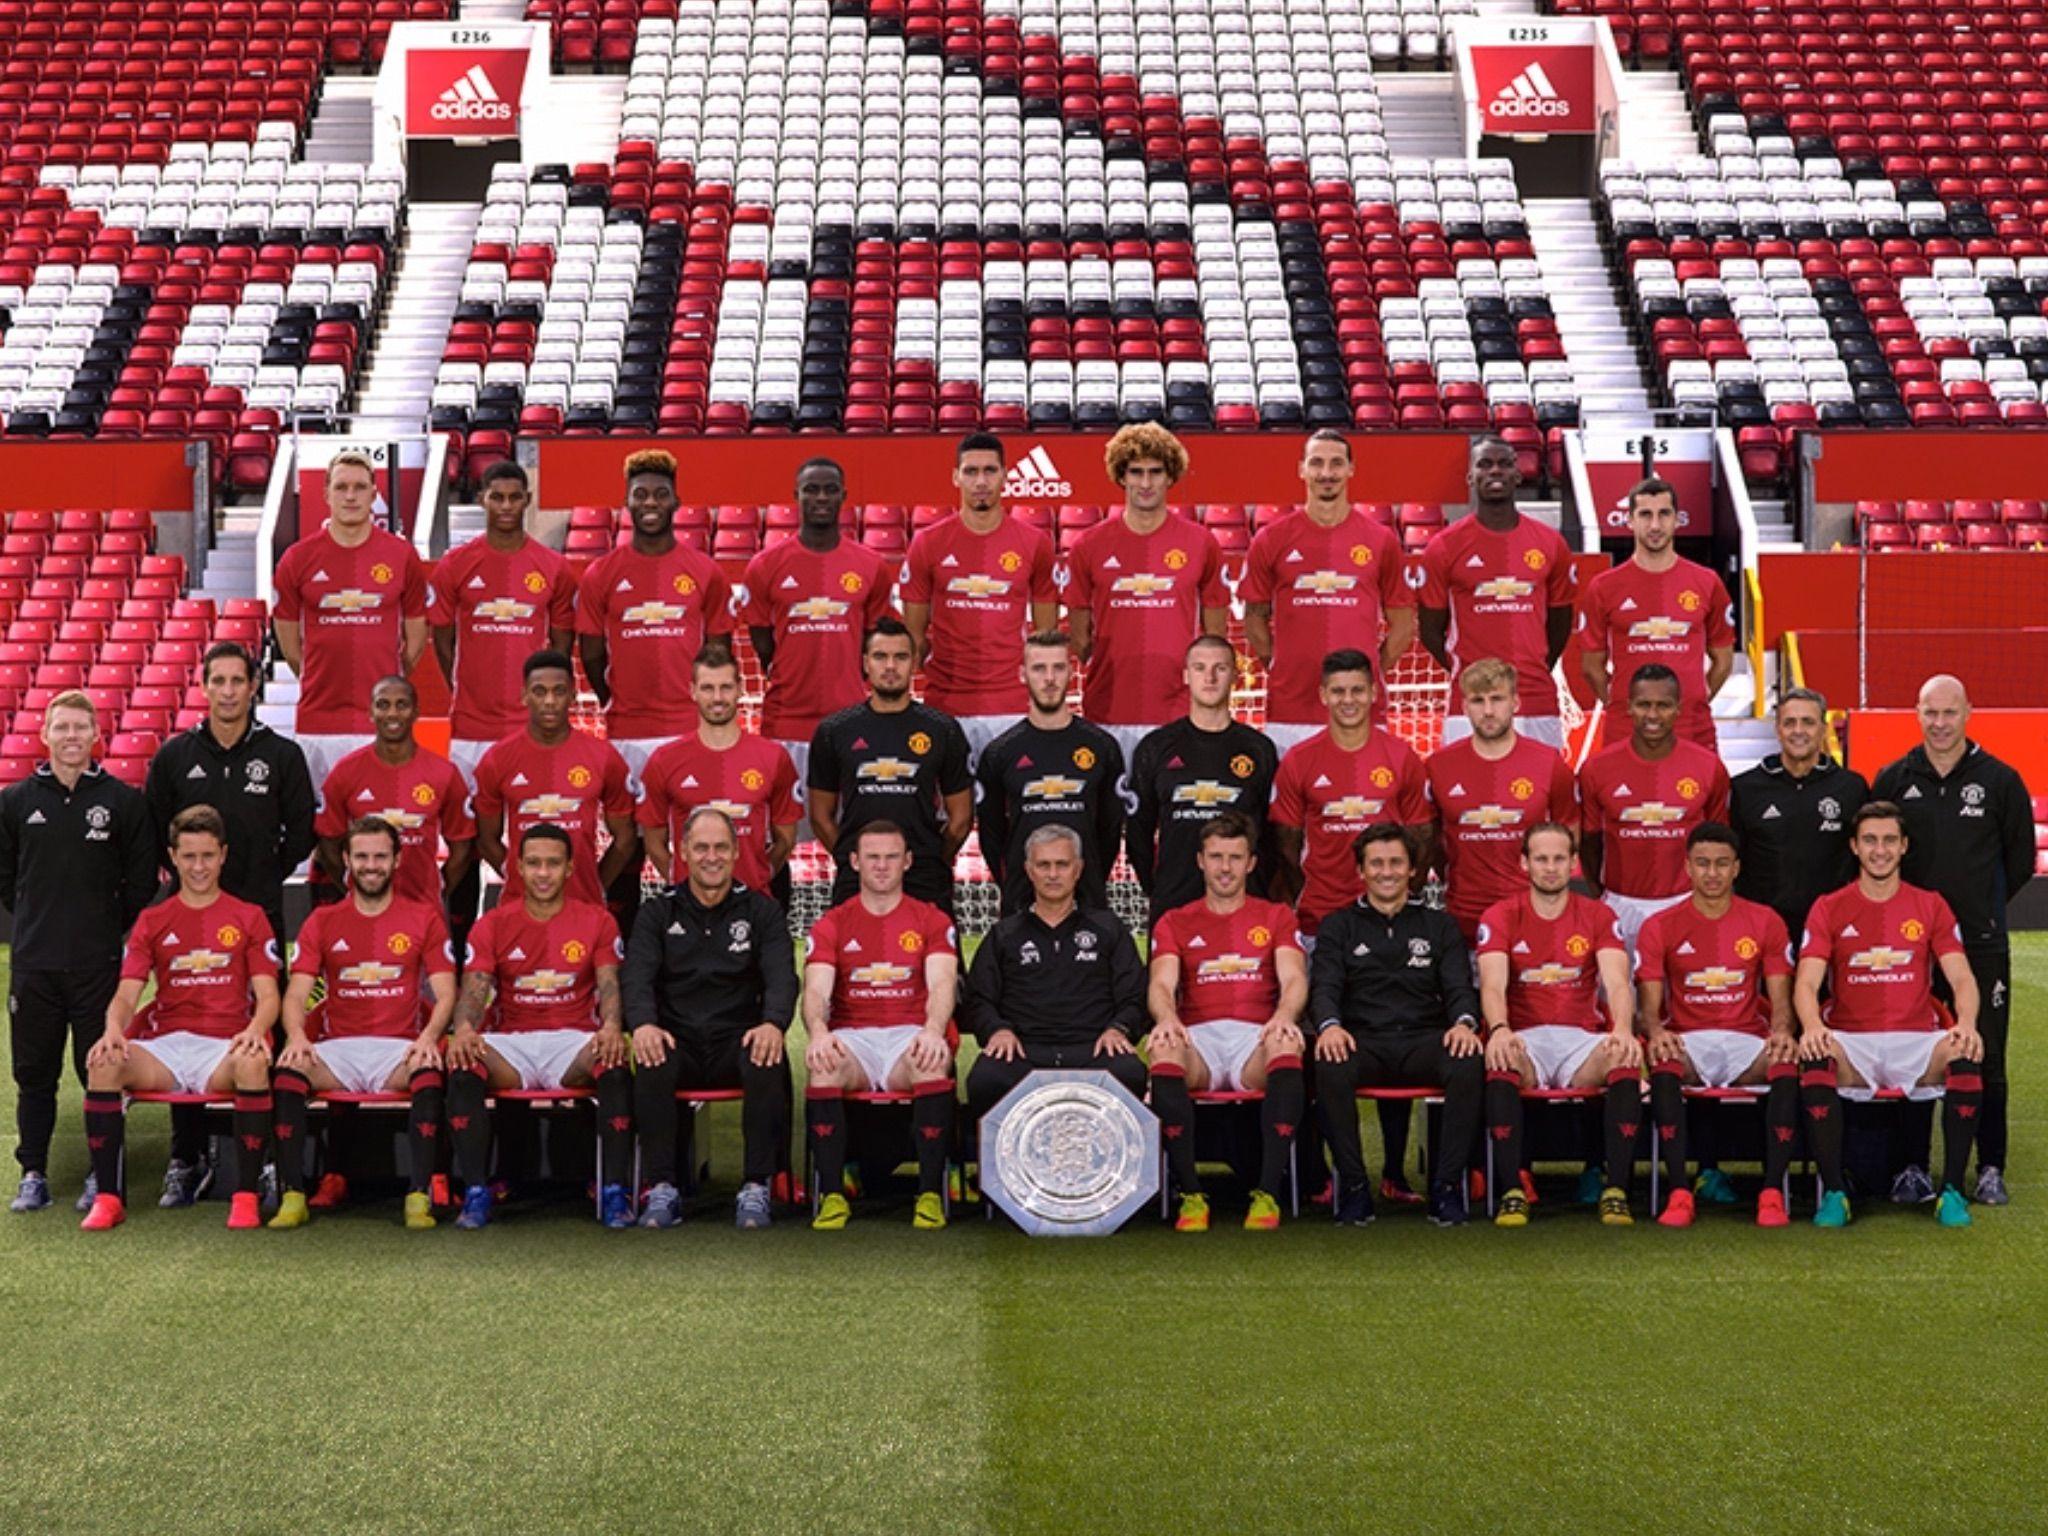 Manchester United 2016/17 | Manchester united, Manchester united football  club, Manchester united team